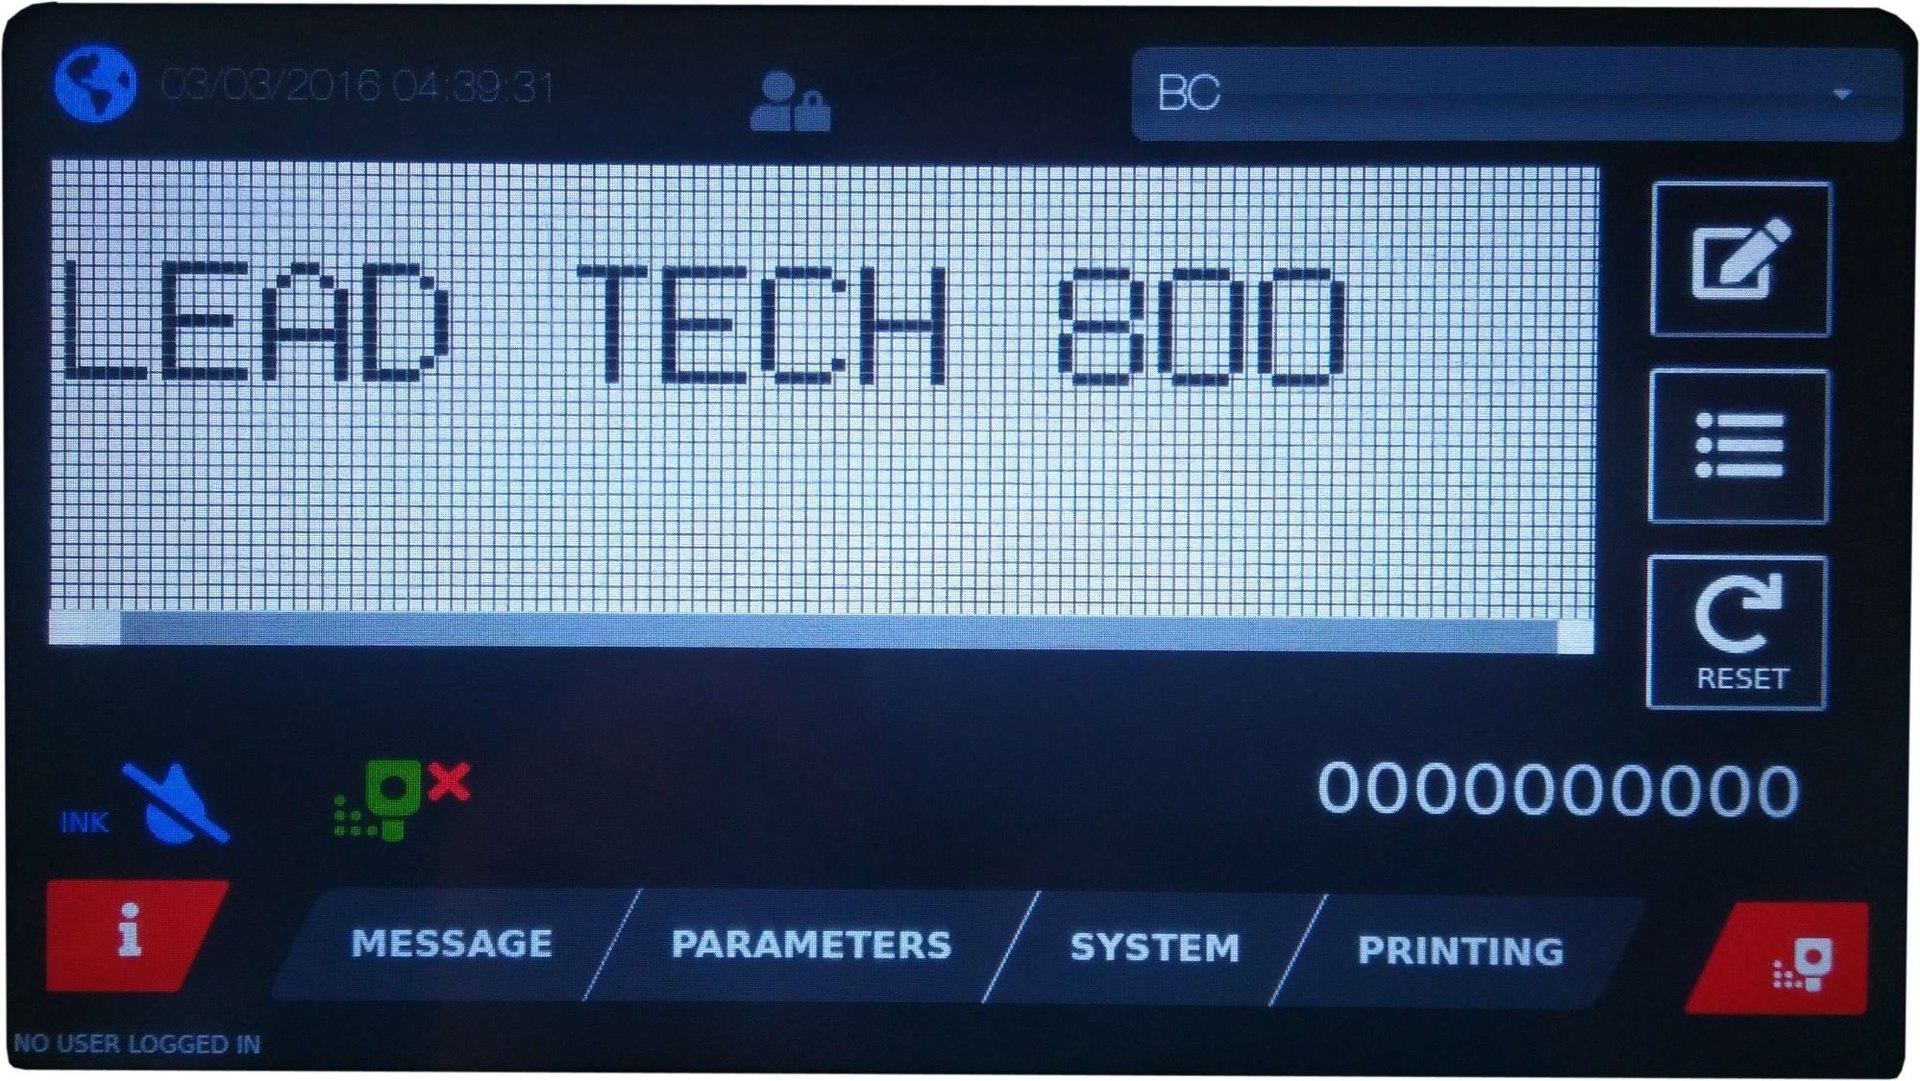 Lead Tech Lt800 Special Print Head Printing Cij Inkjet Printer